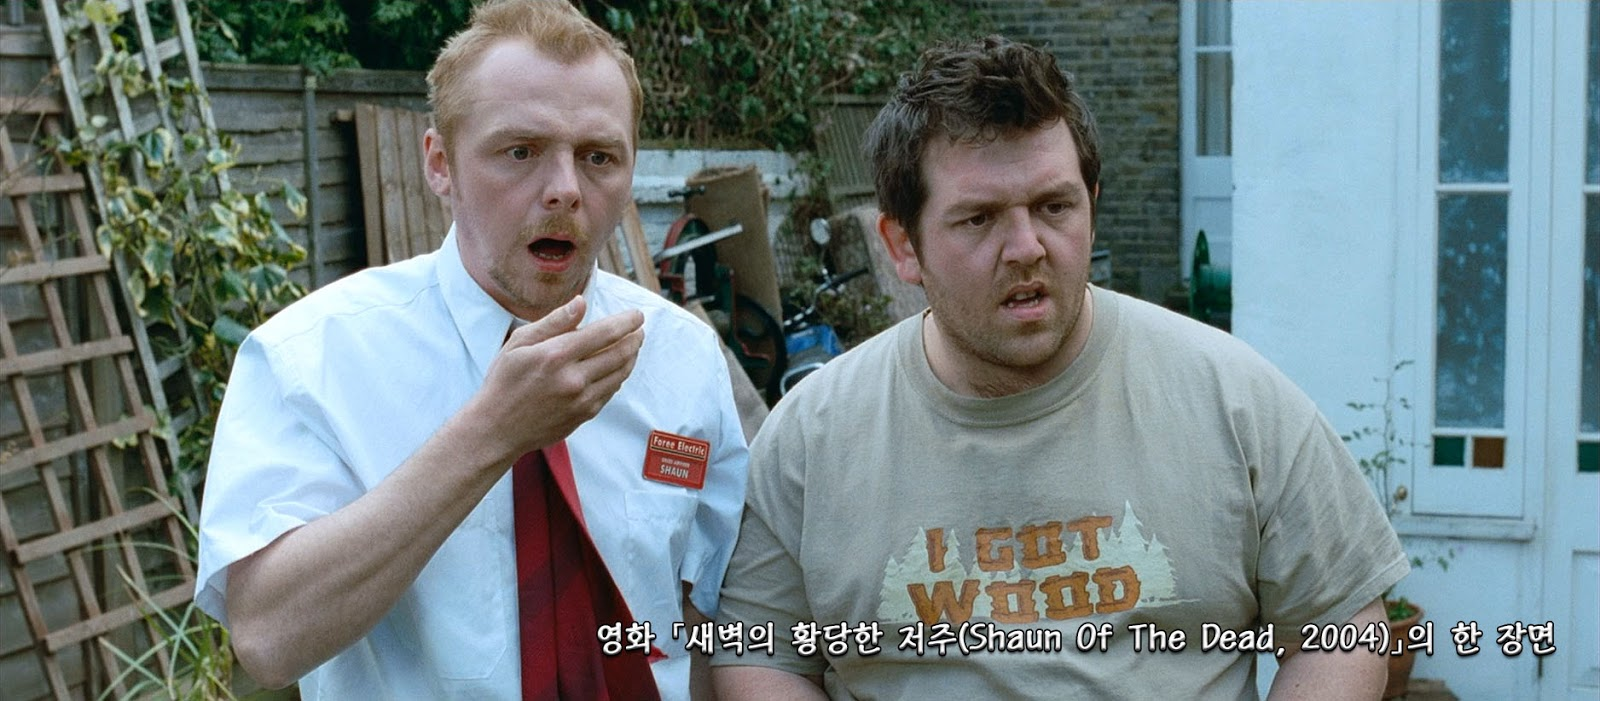 Shaun Of The Dead 2004 scene 01